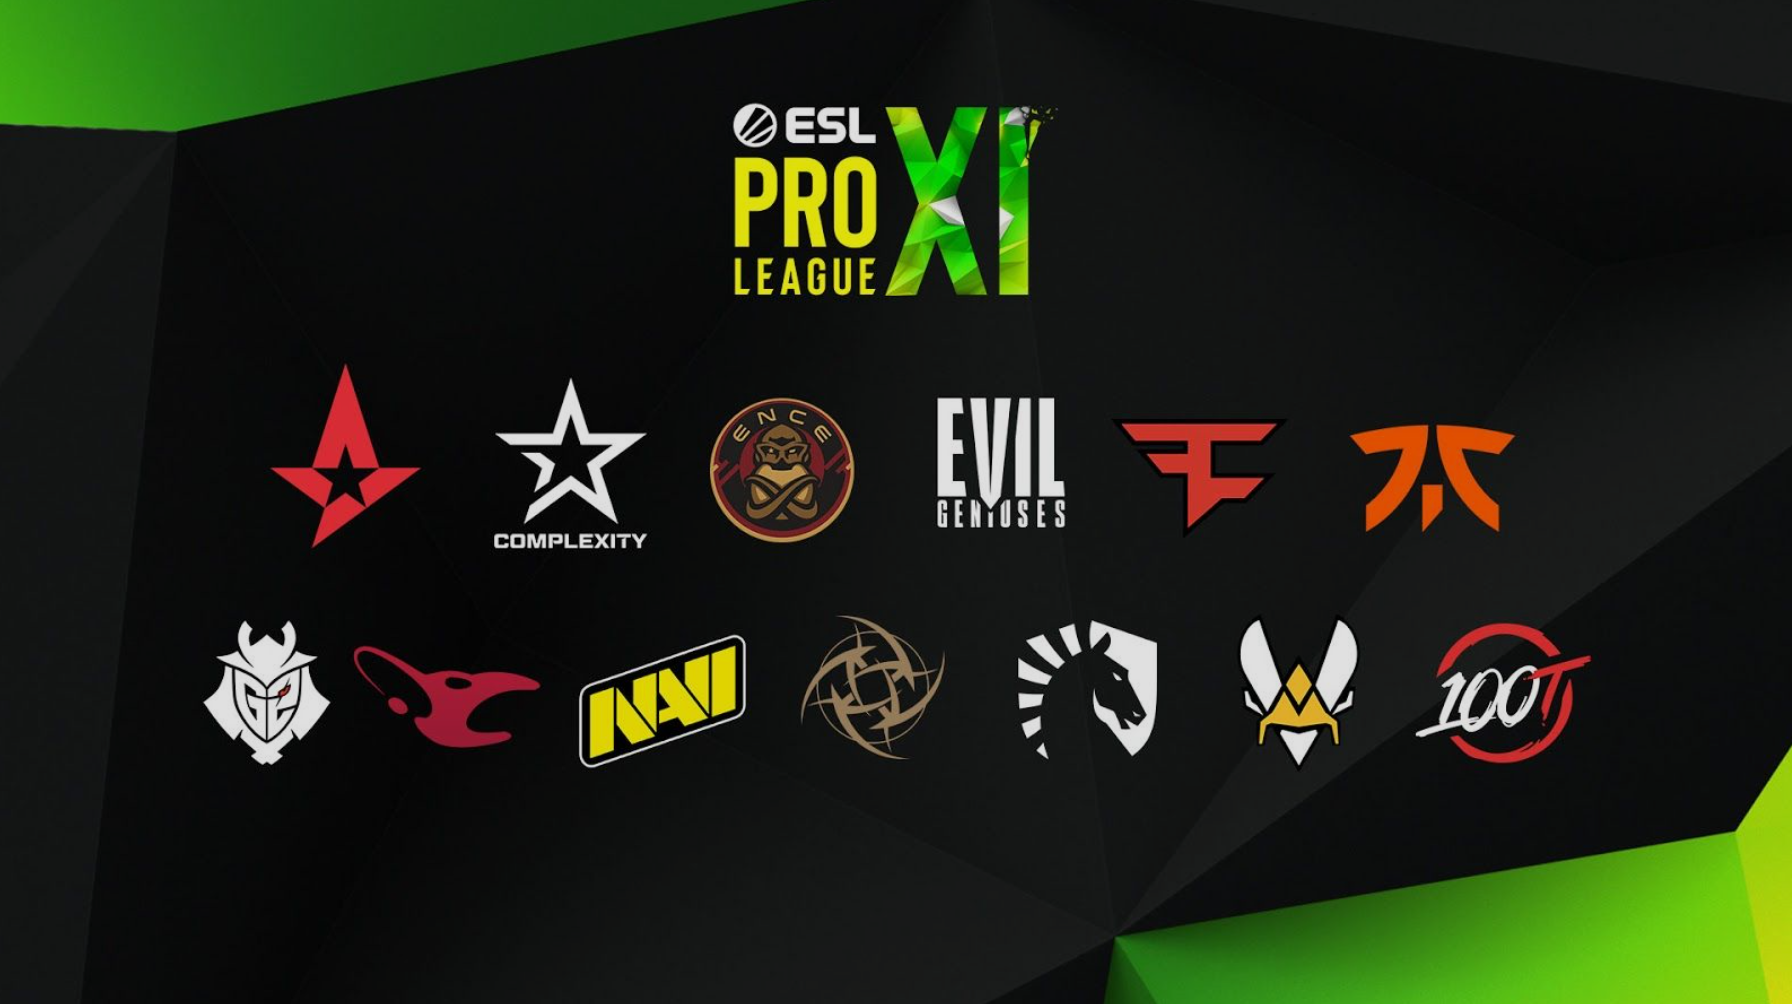 ESL's Louvre agreement founding teams.